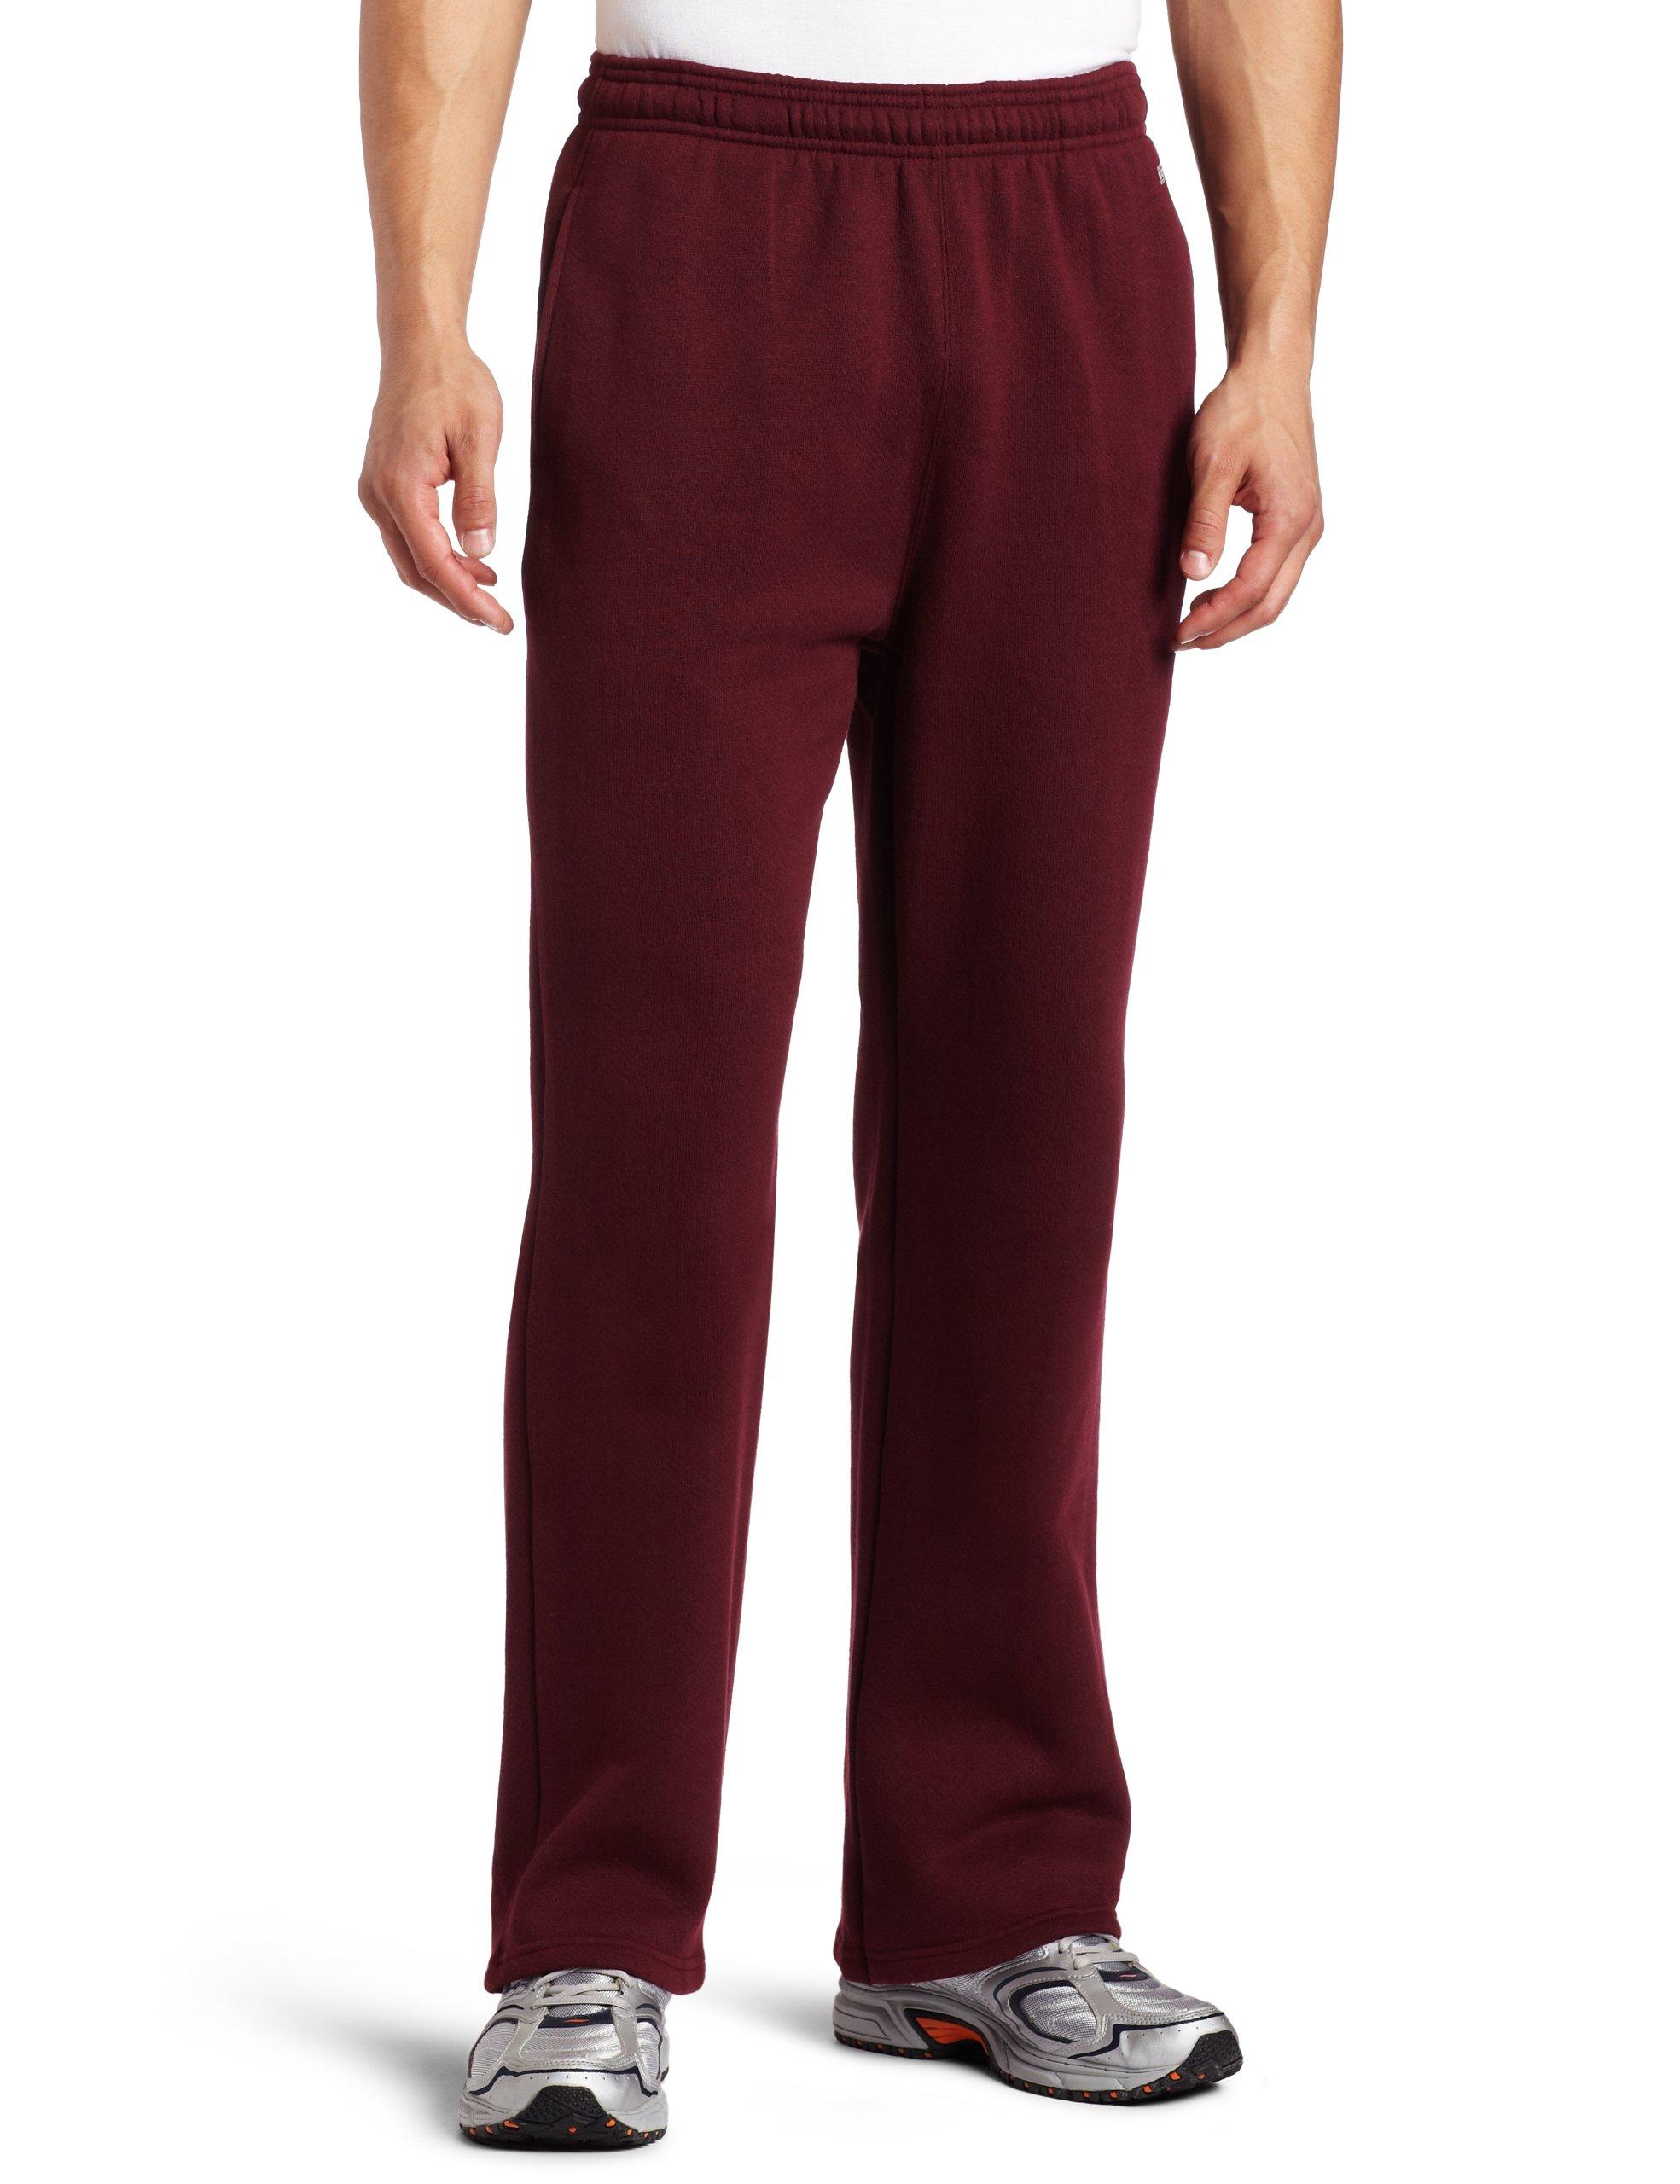 Soffe MJ Men's Training Fleece Pocket Pant, Maroon Small